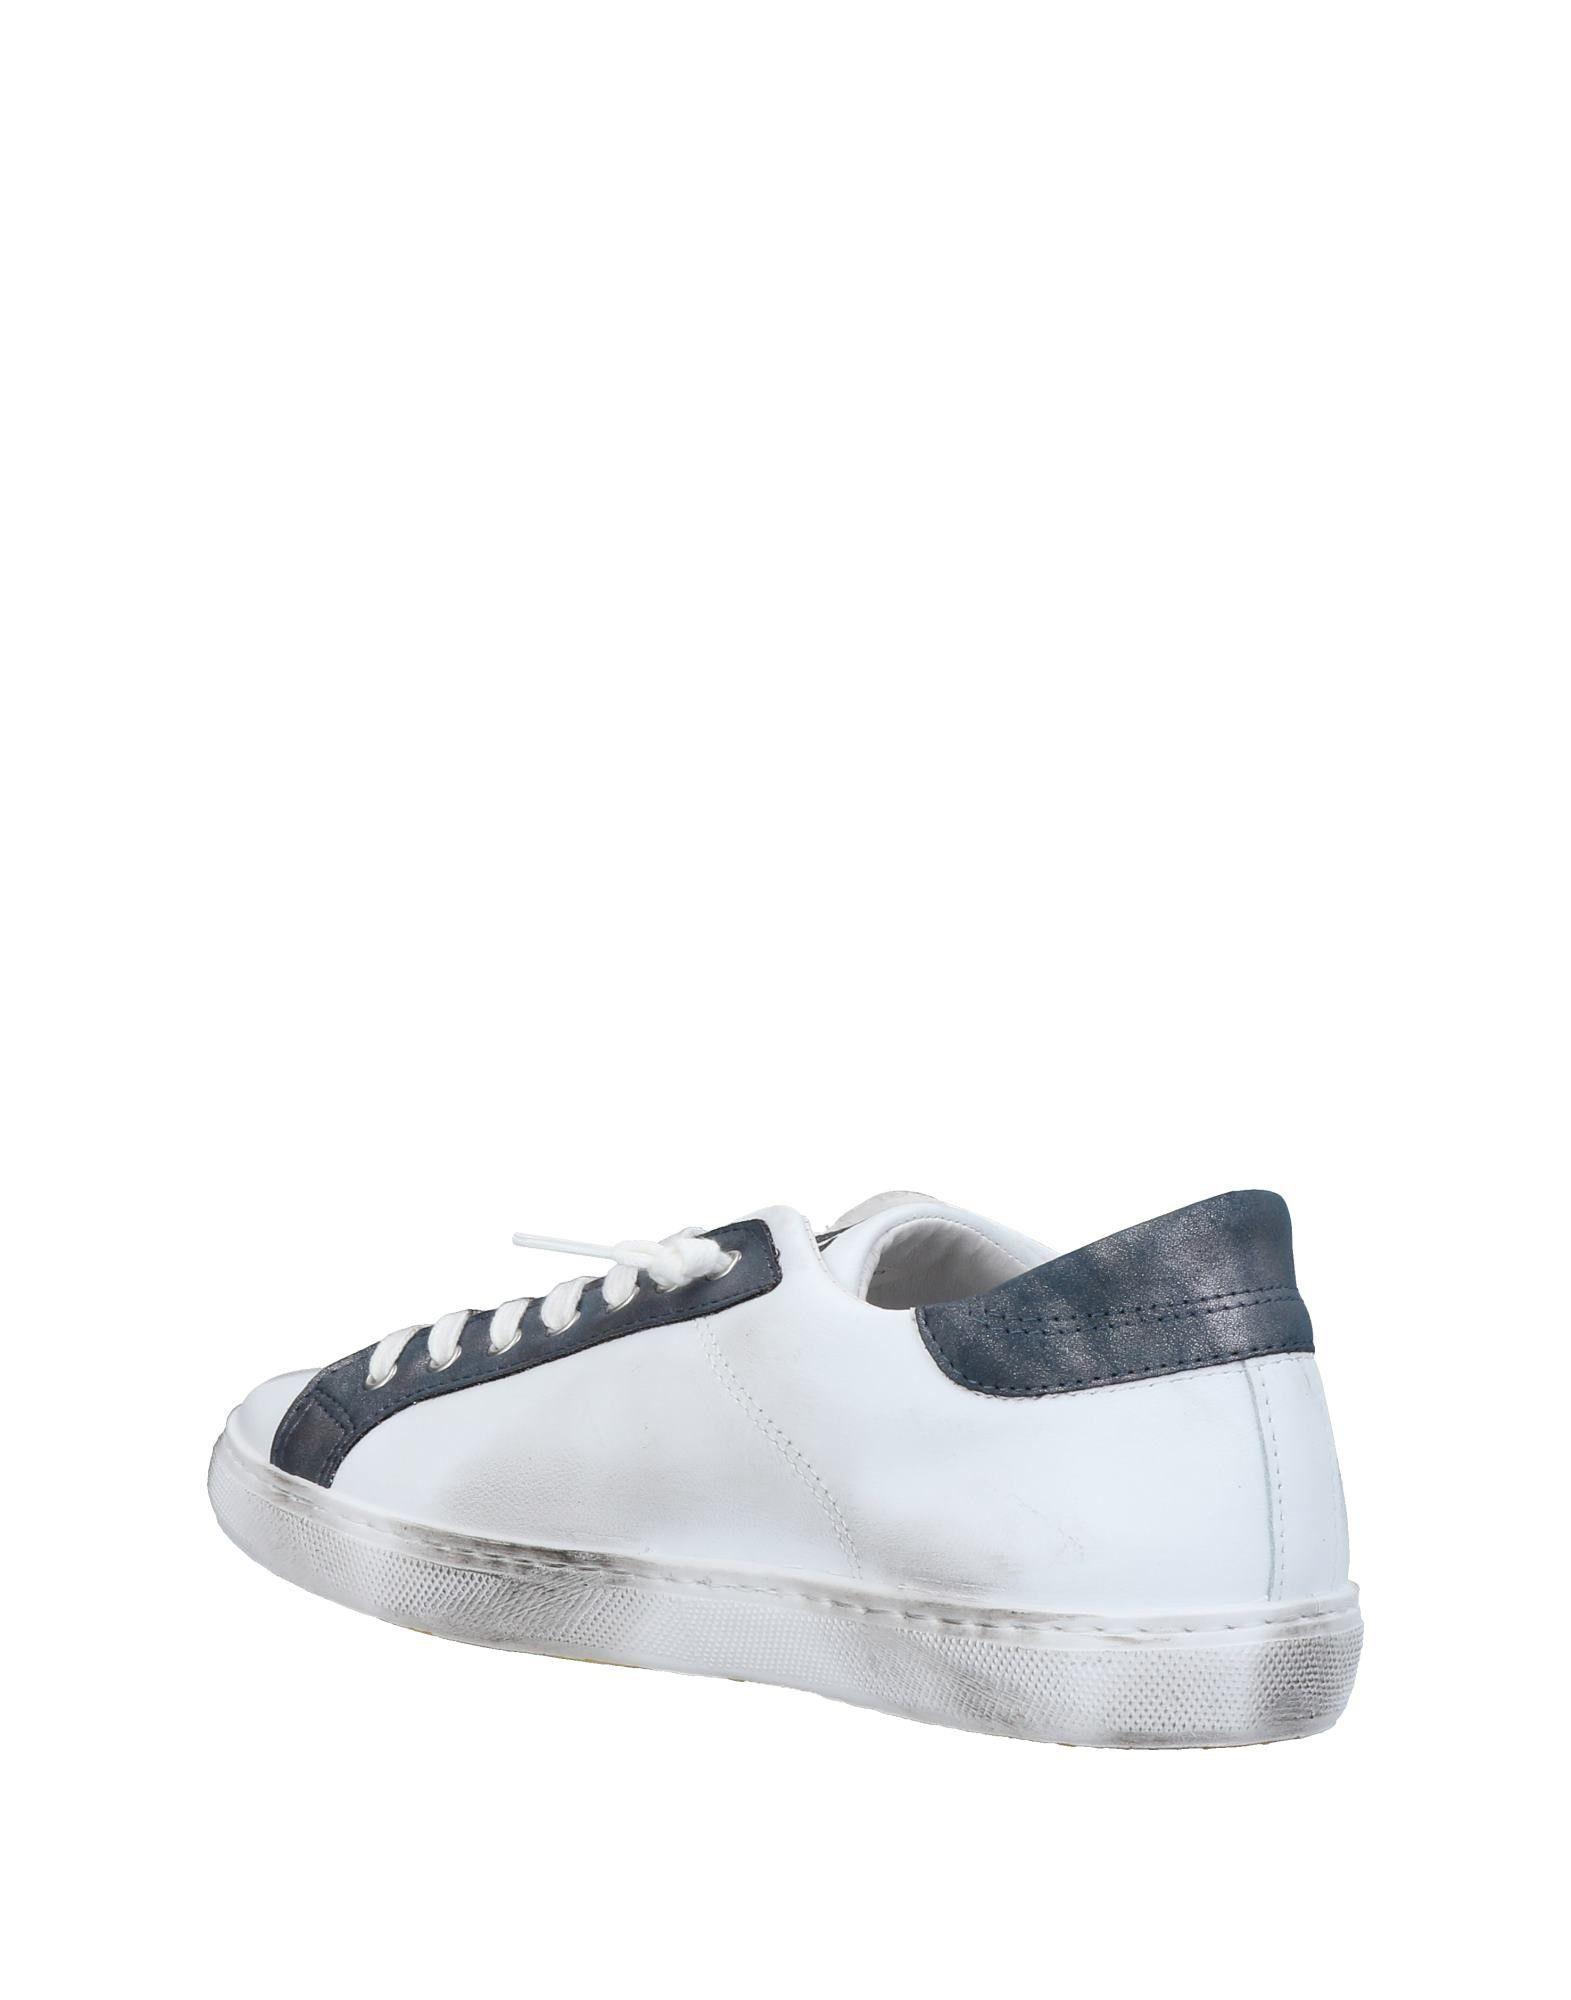 Rabatt echte Schuhe 2Star Sneakers 11453481OB Herren  11453481OB Sneakers e24712